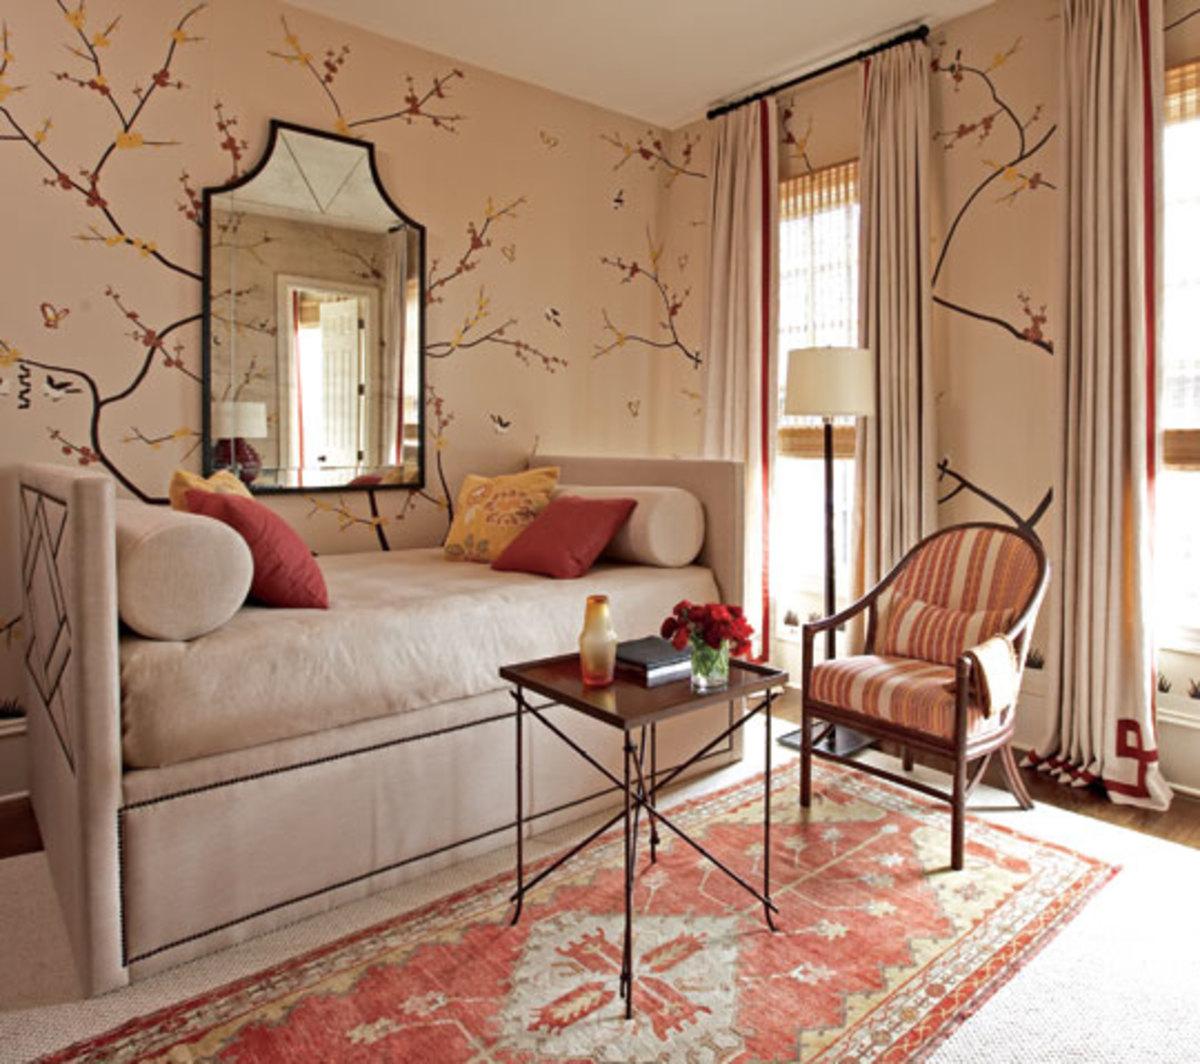 Emejing Daybed Bedroom Ideas Gallery - Amazin Design Ideas - hooz.us